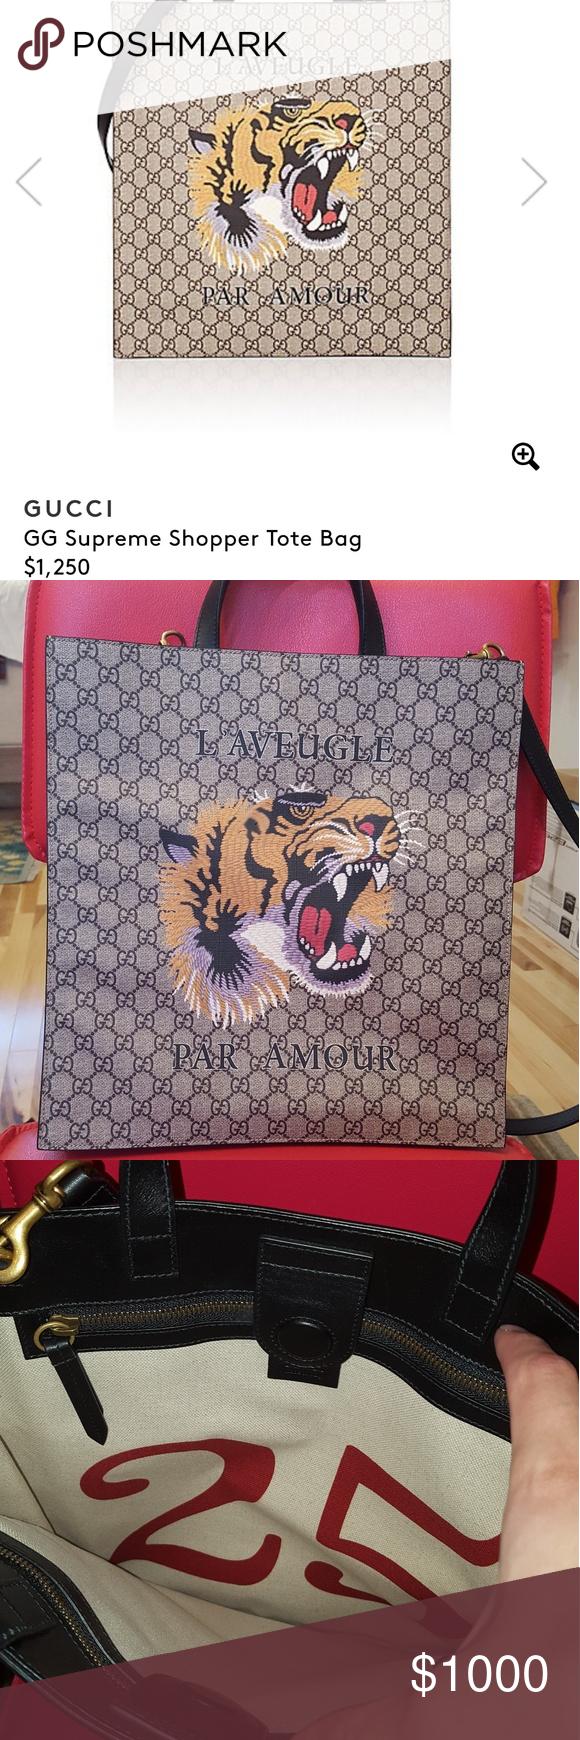 9dacdf79f36c6b Gucci GG Supreme Shopper Tote Bag Italian leather Monogrammed GG logo  Iconic Gucci tiger print 9.5